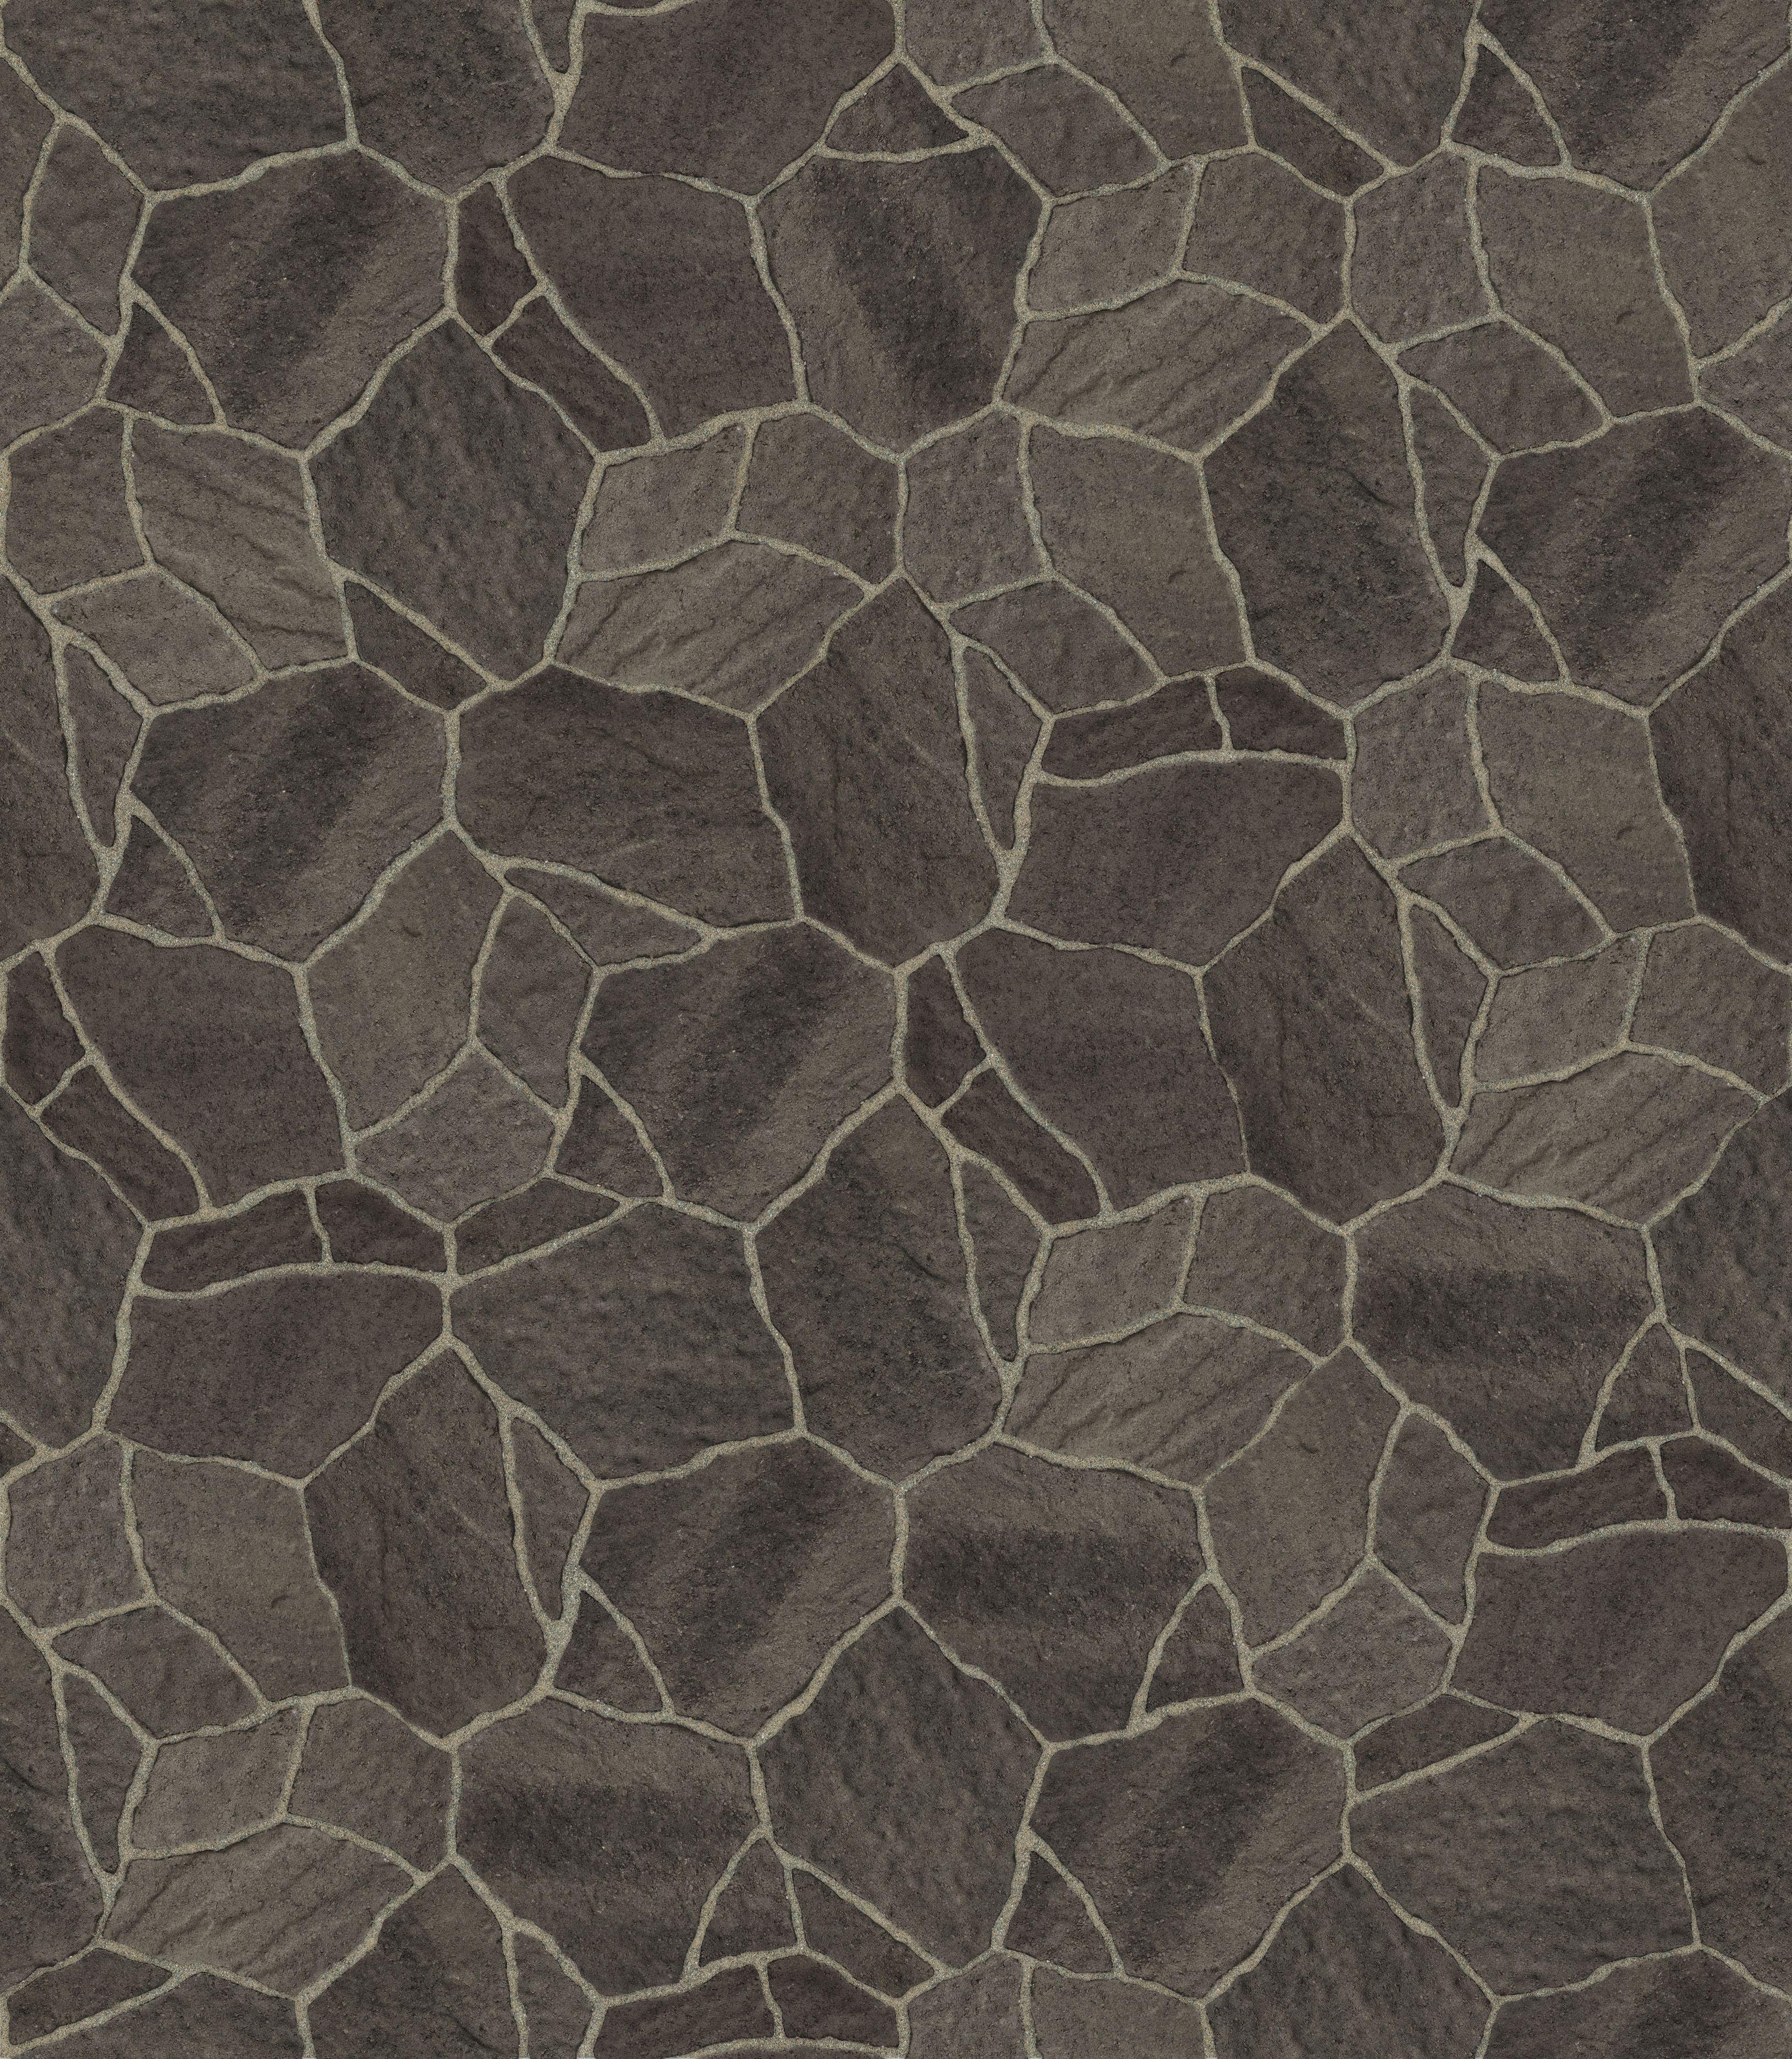 Slate Tile Texture Seamless Light grey dark grey Dokular